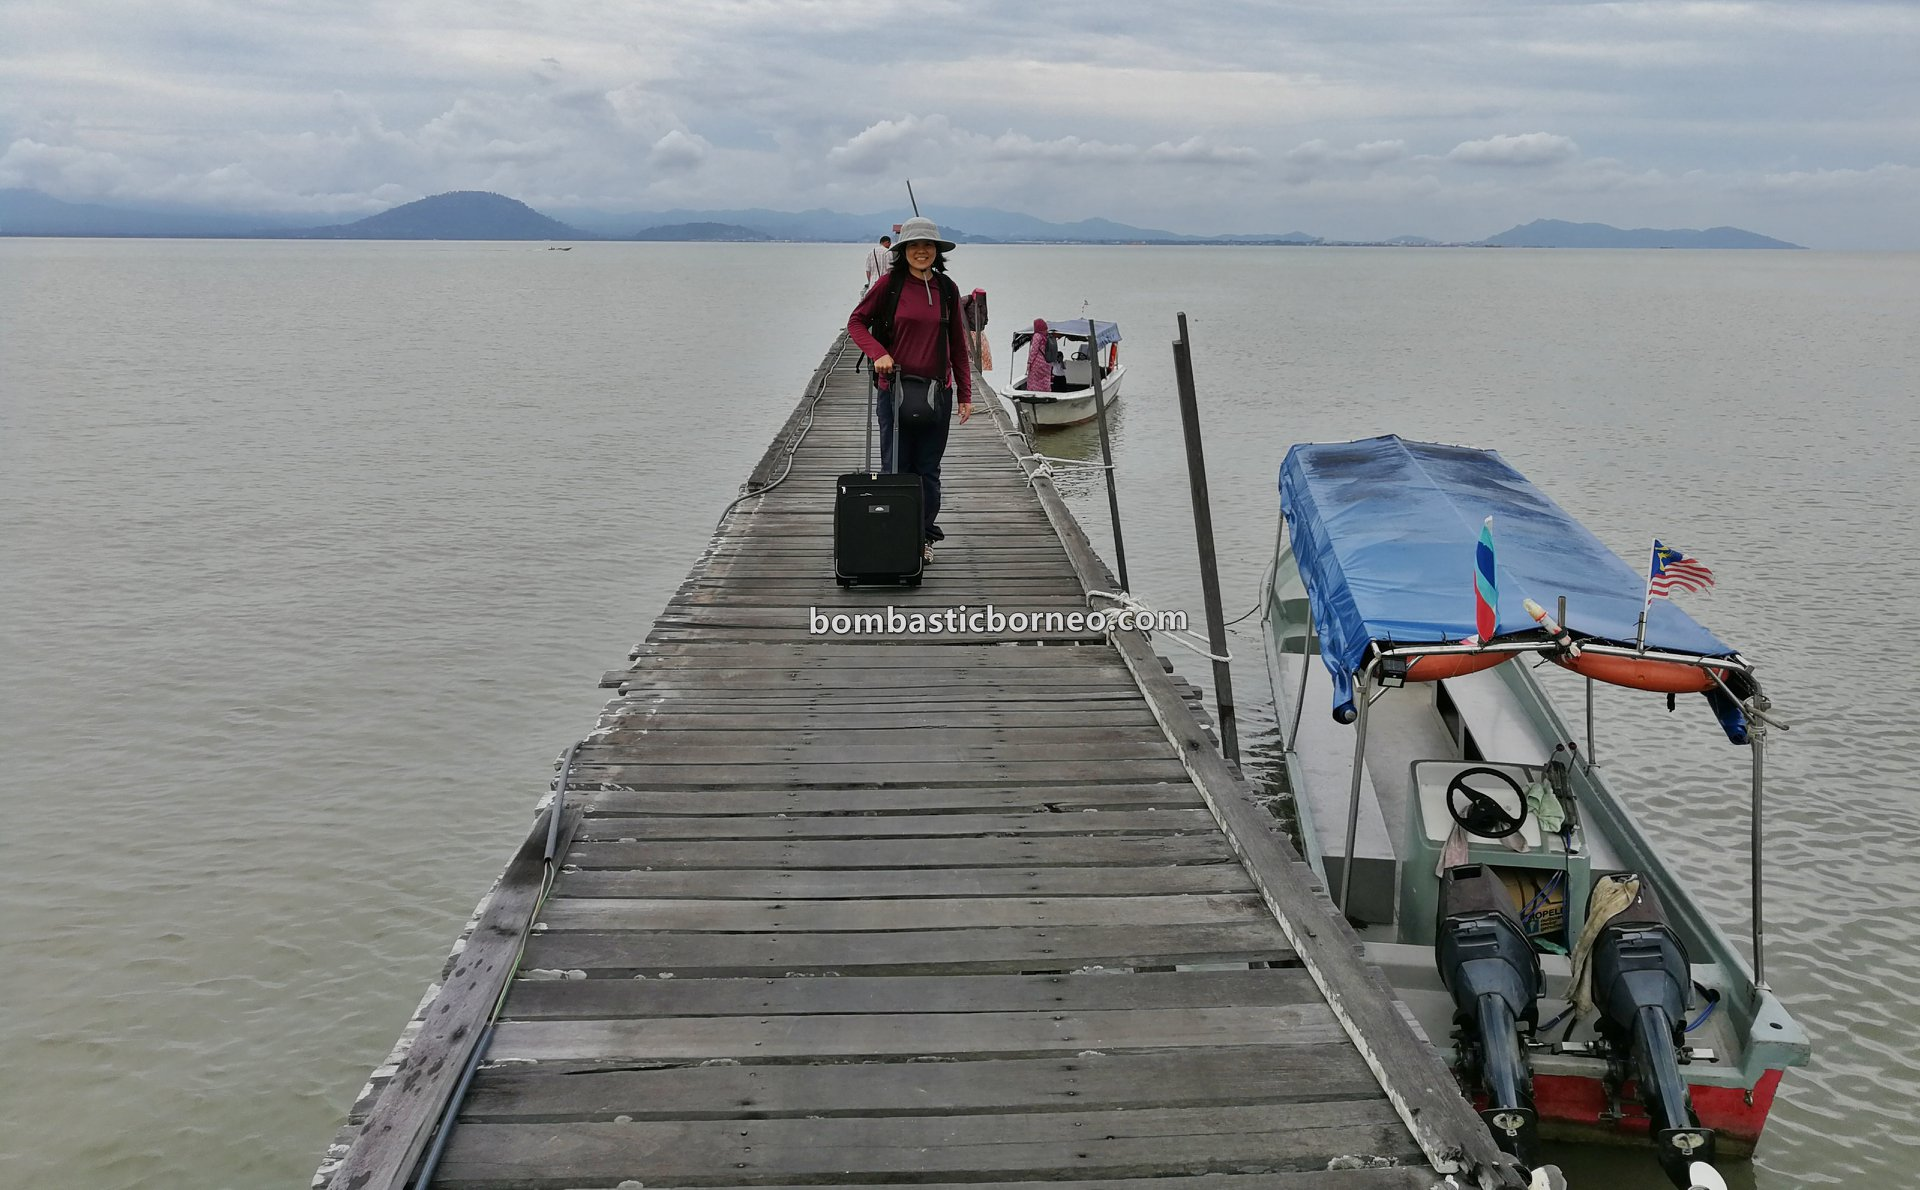 Island, boat ride, jelajah, exploration, adventure, backpackers, Malaysia, kampung melayu, tourism, Travel Guide, Trans Border, Borneo, 跨境婆罗洲游踪, 马来西亚沙巴斗湖